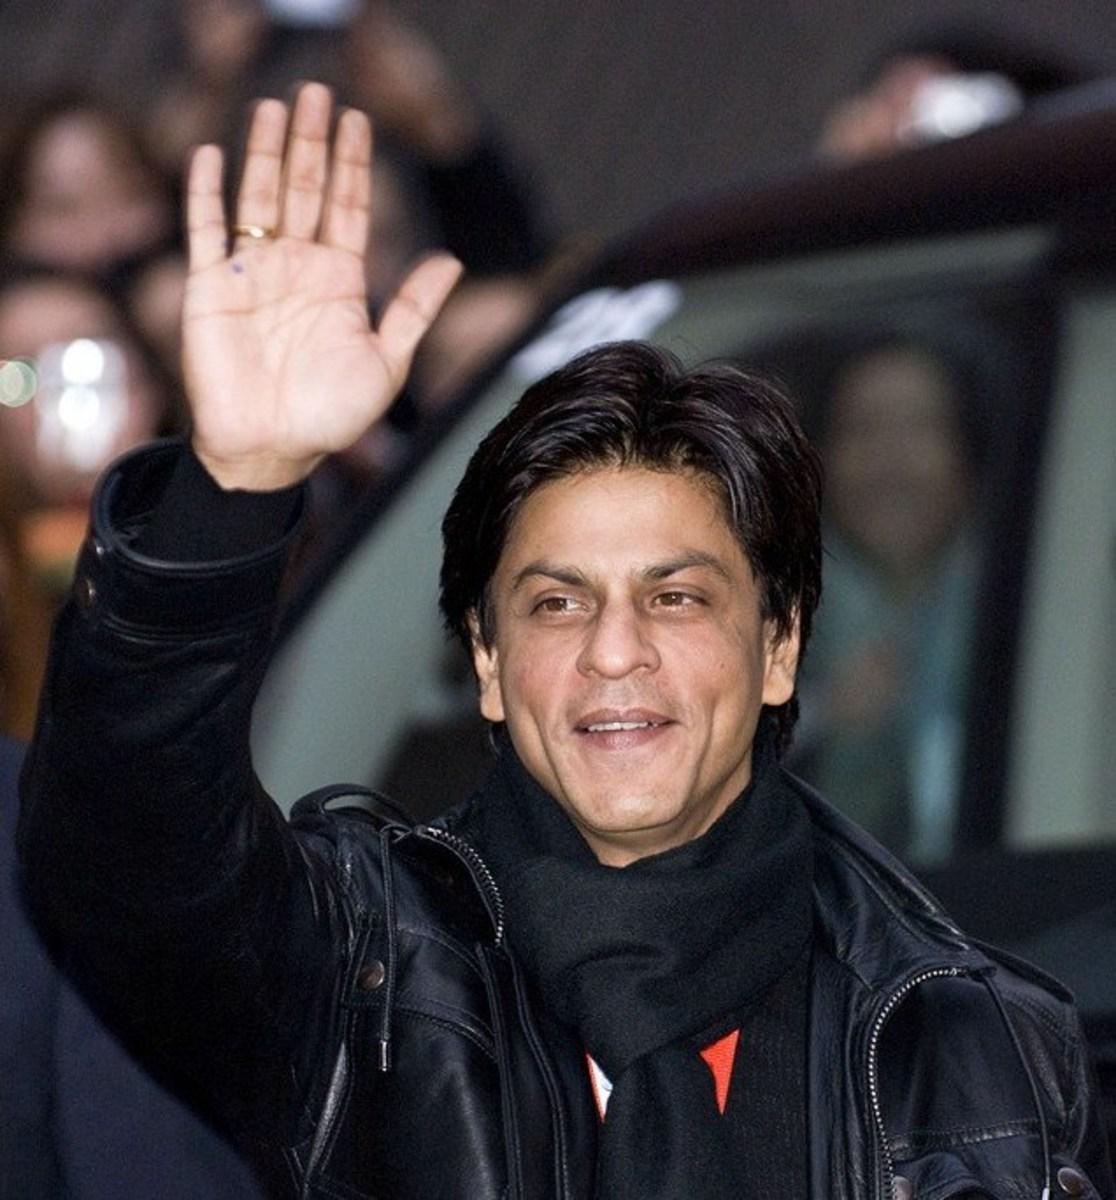 Shah Rukh Khan in 2008